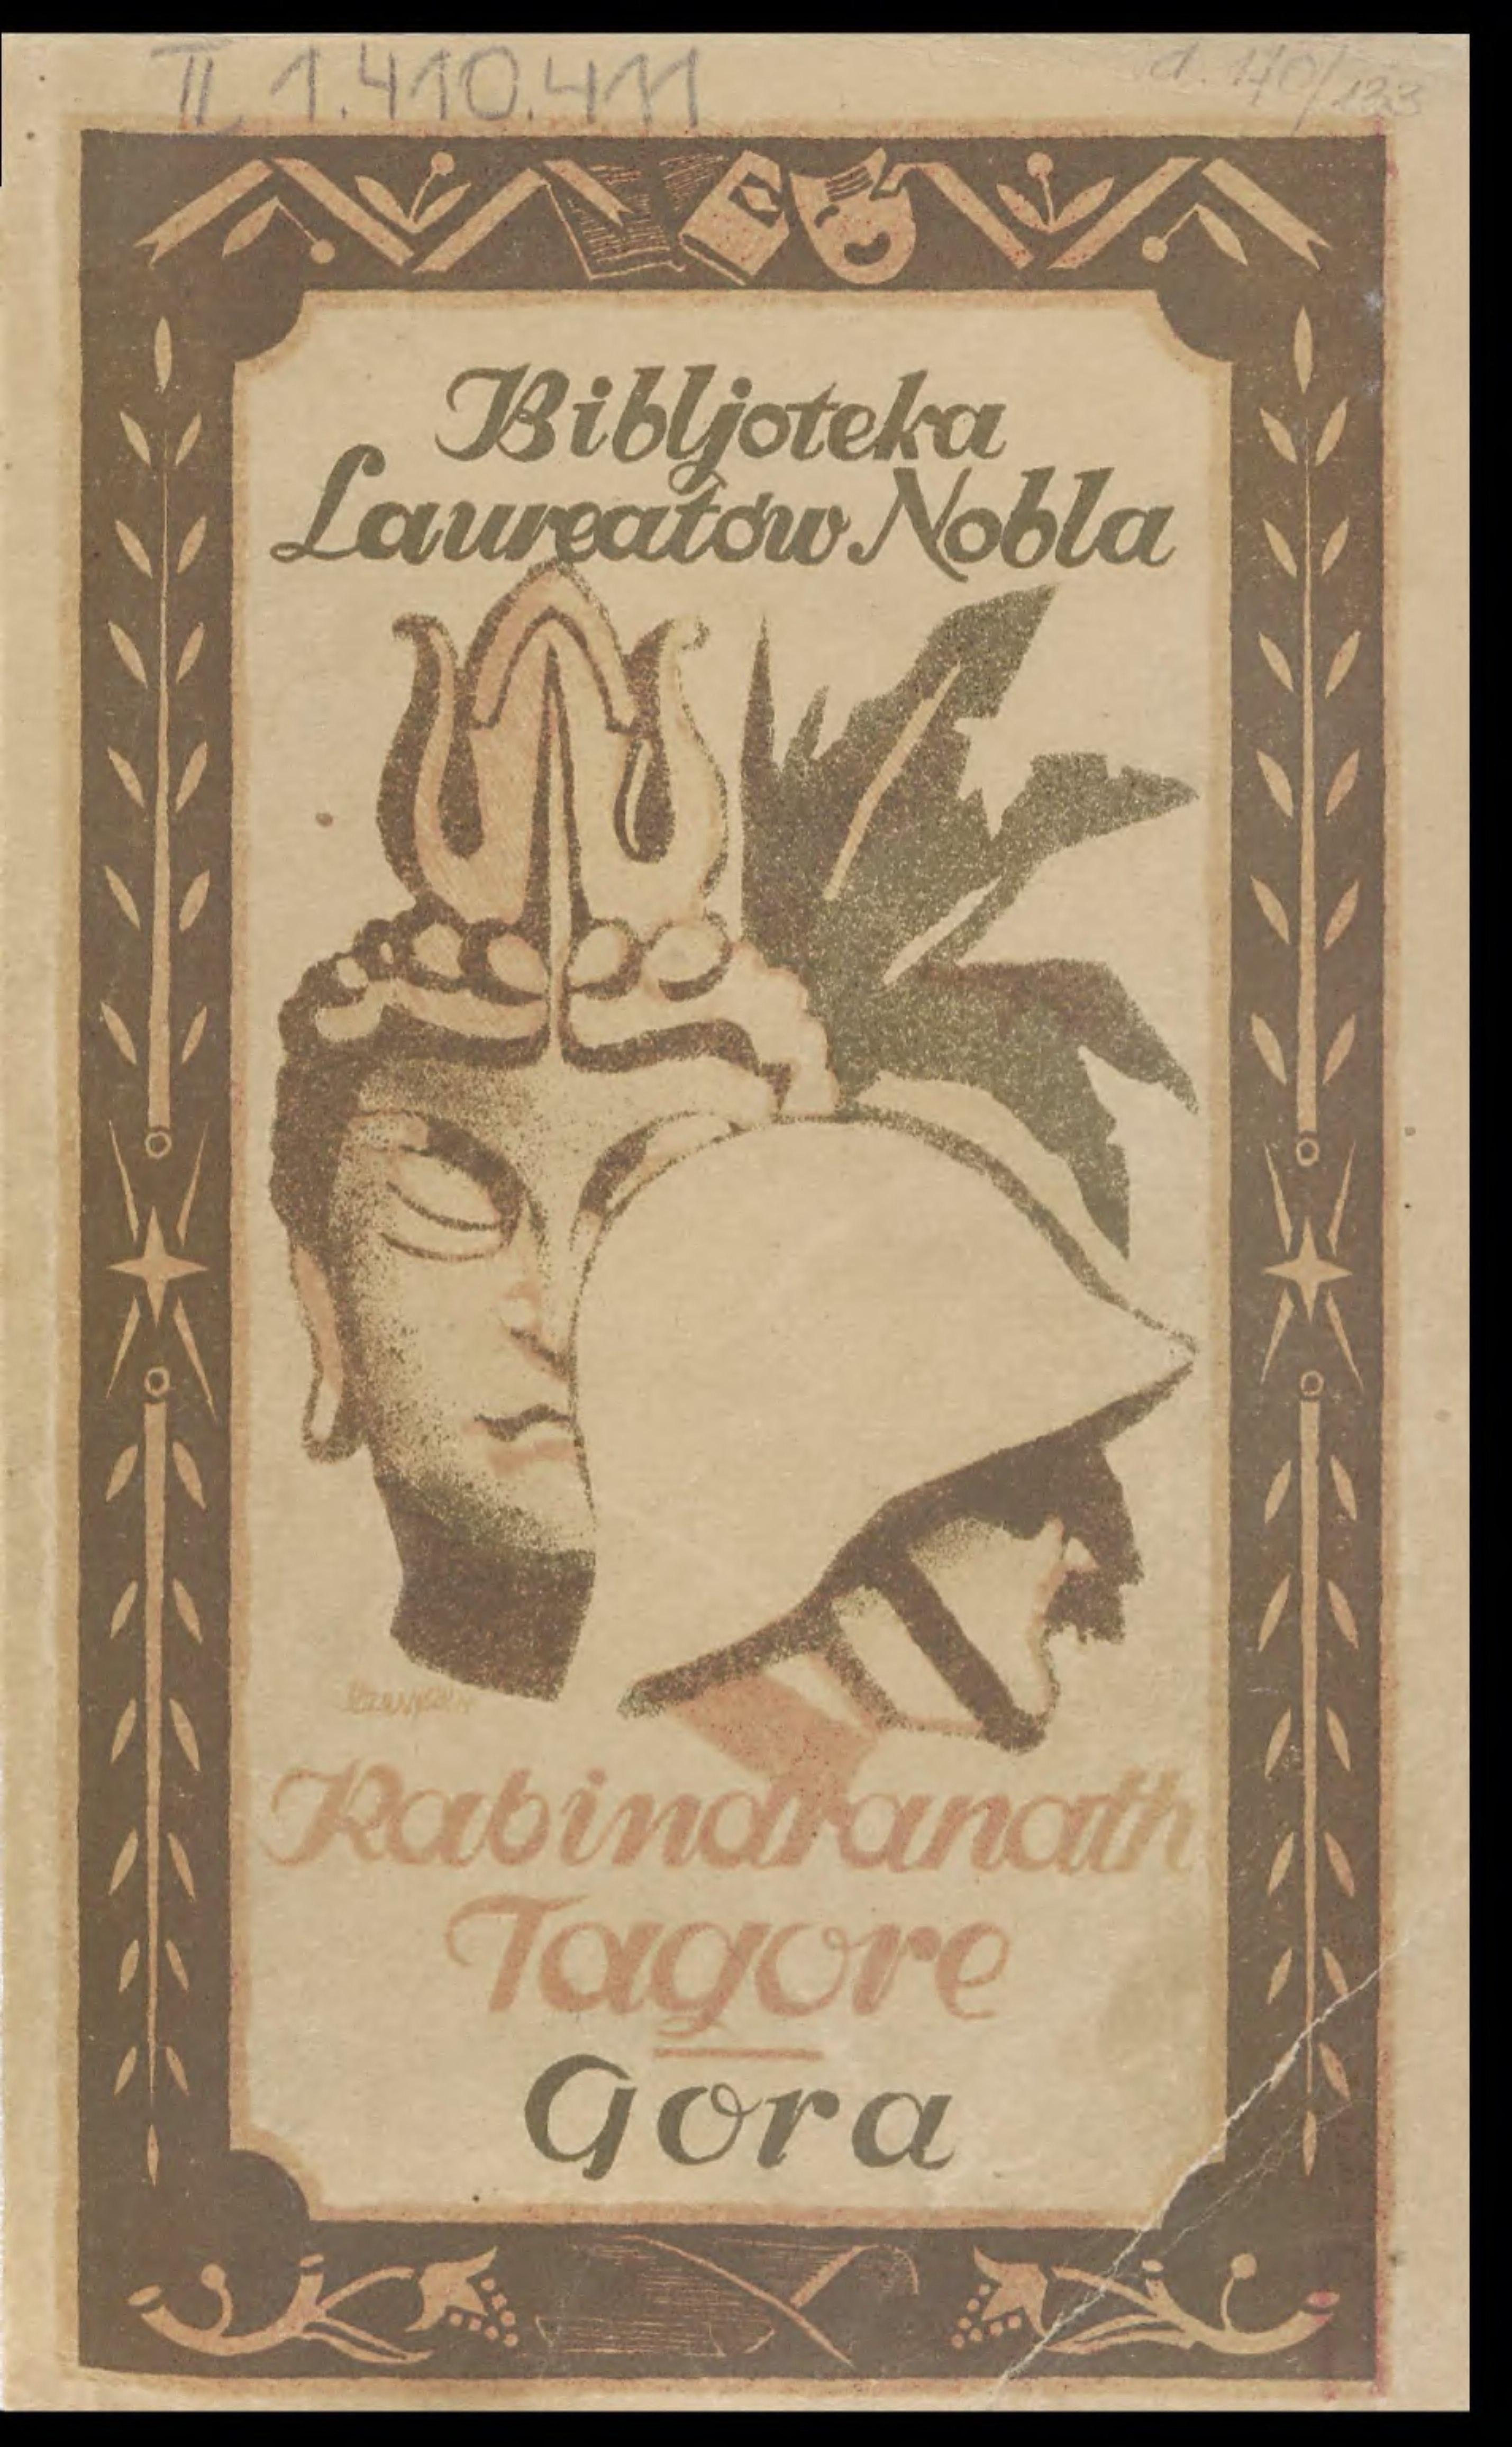 File:Rabindranath Tagore - Gora djvu - Wikimedia Commons